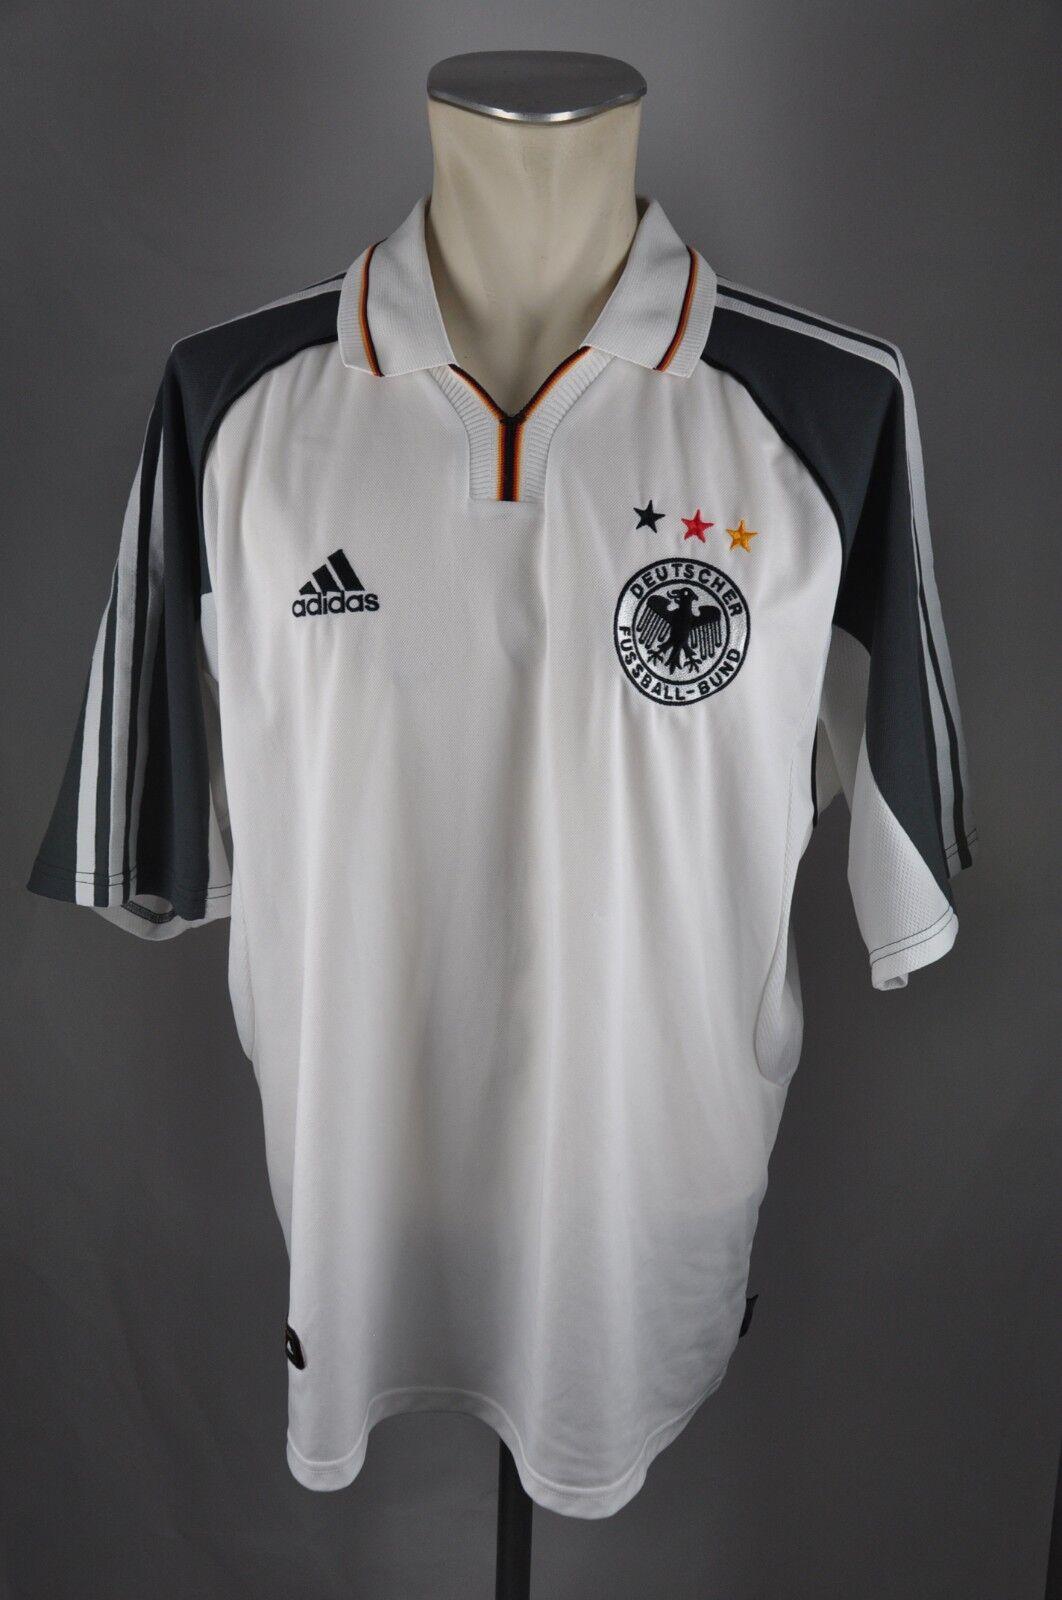 Deutschland Trikot 2000 Gr. XL  2 Adidas Jersey DFB Germany WM EM Shirt    Erste Qualität